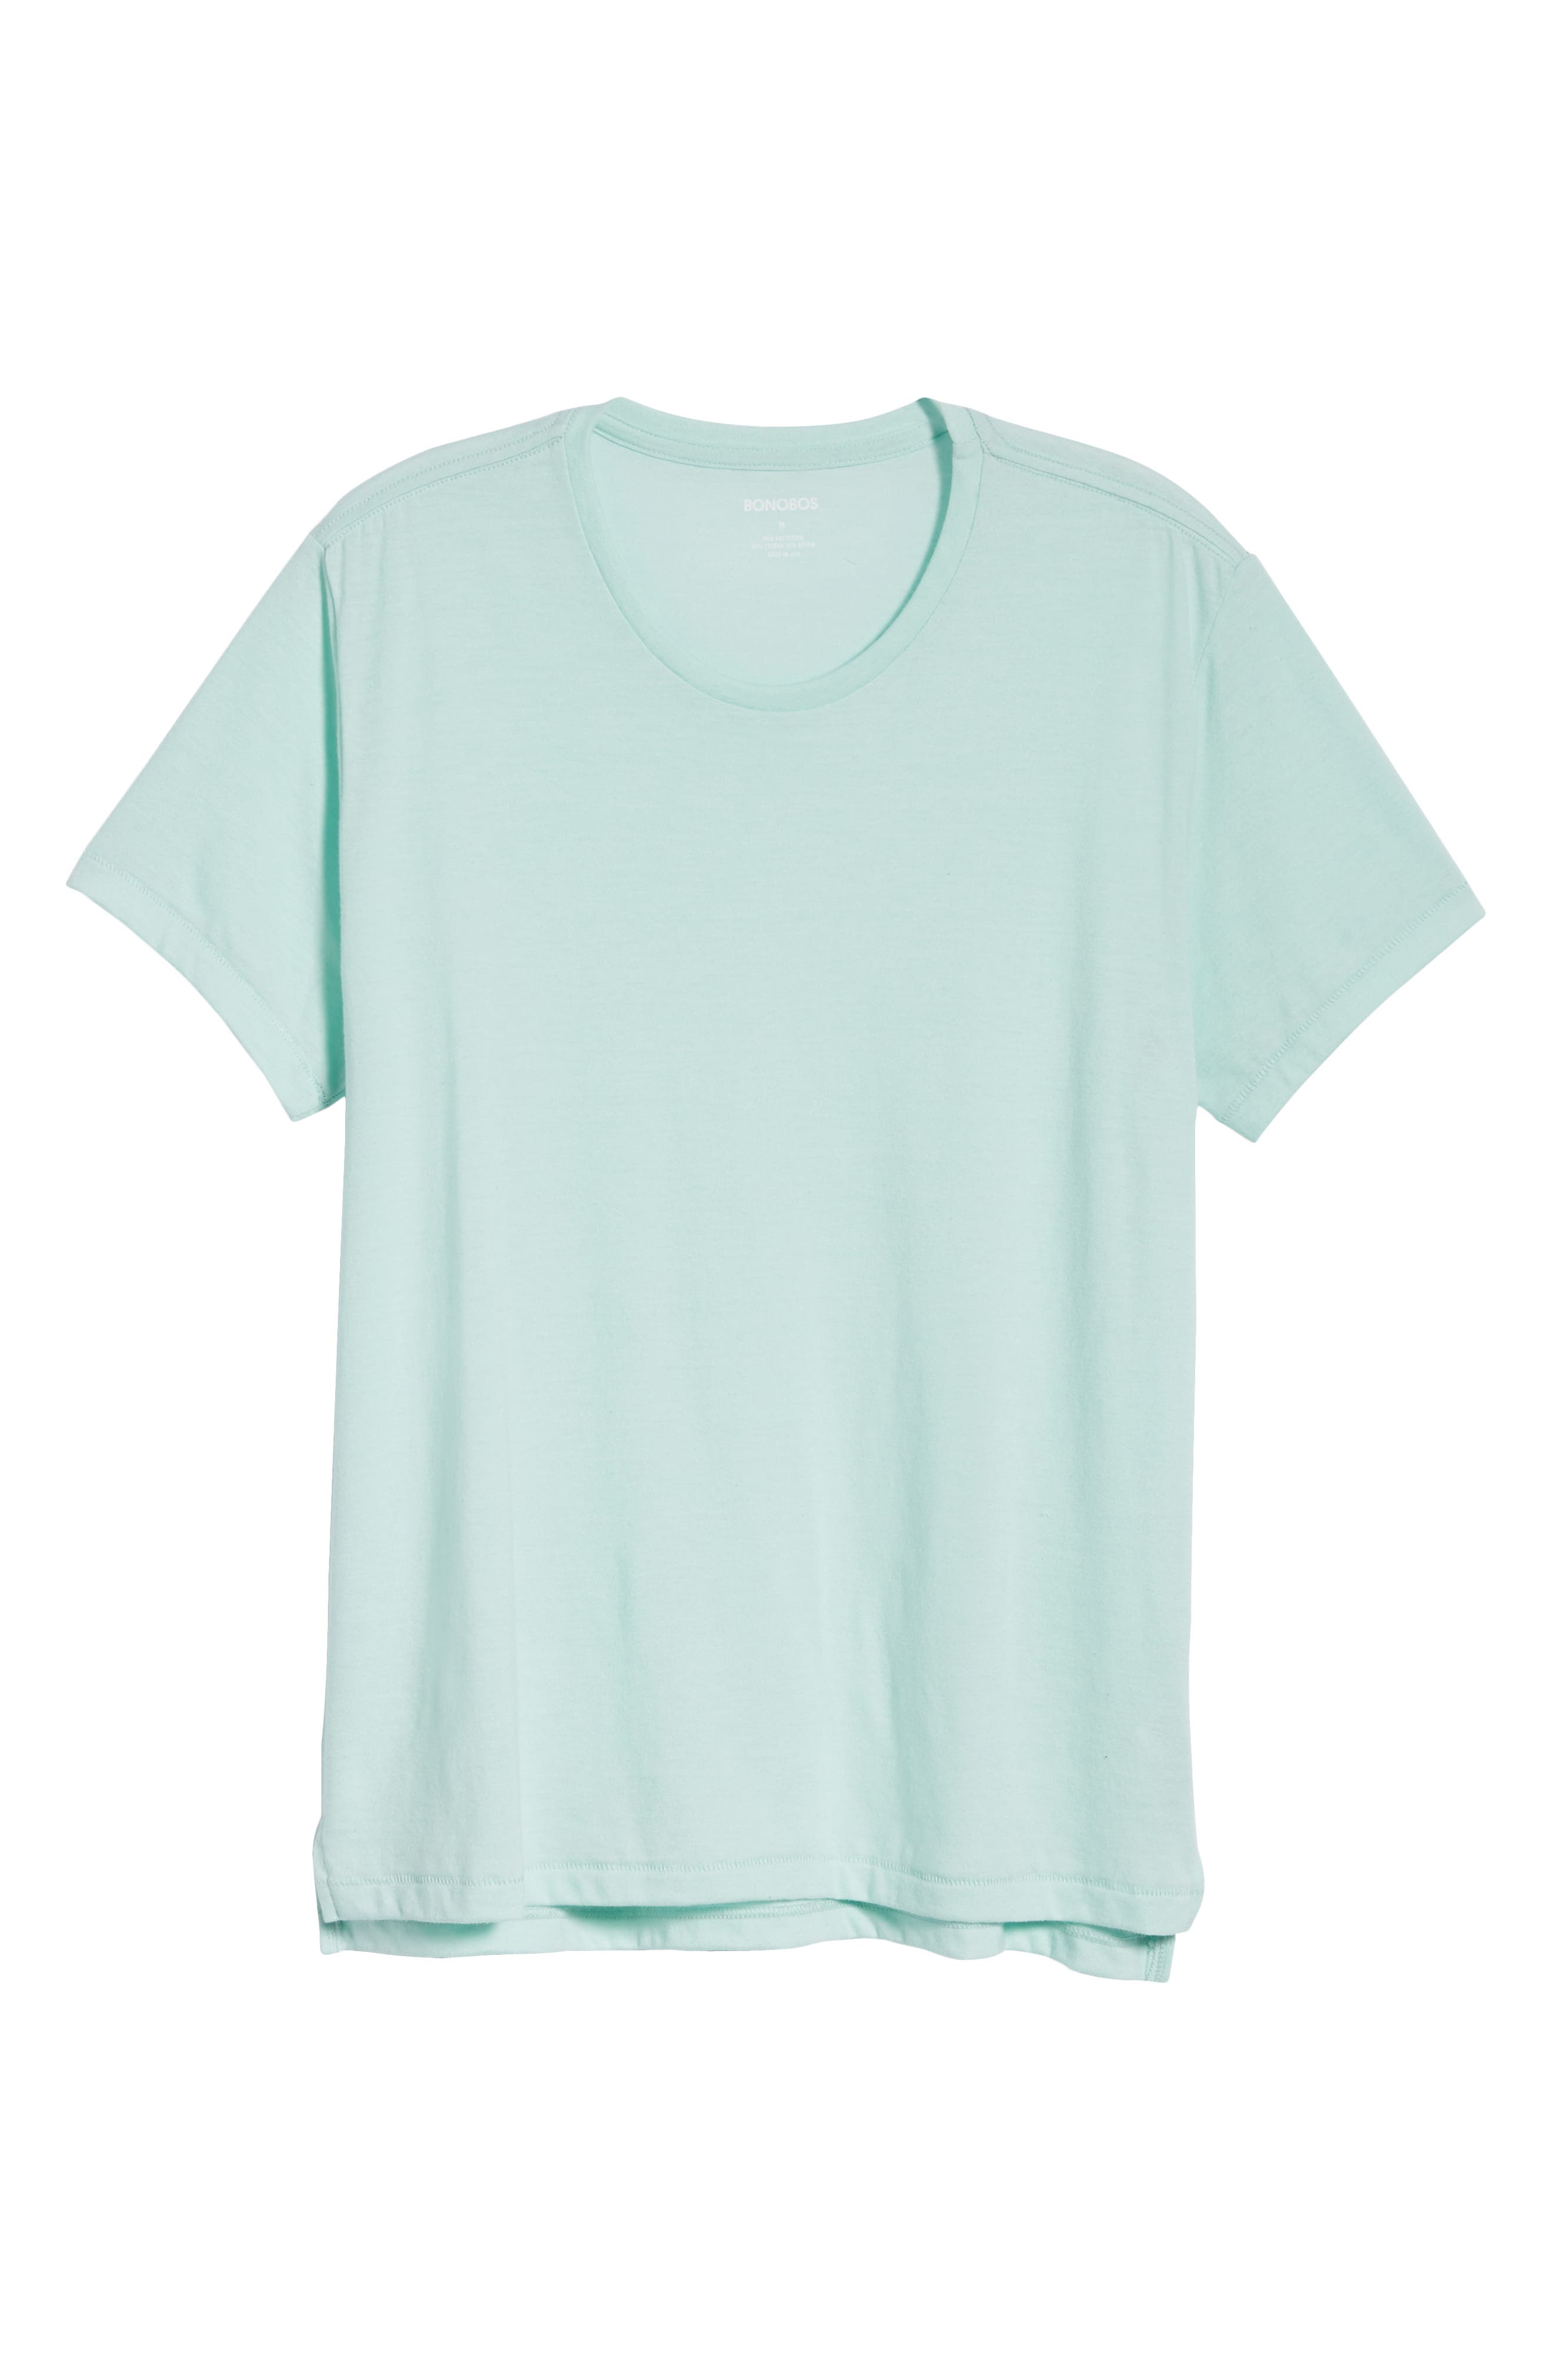 LA Slim Fit Heathered T-Shirt,                             Alternate thumbnail 16, color,